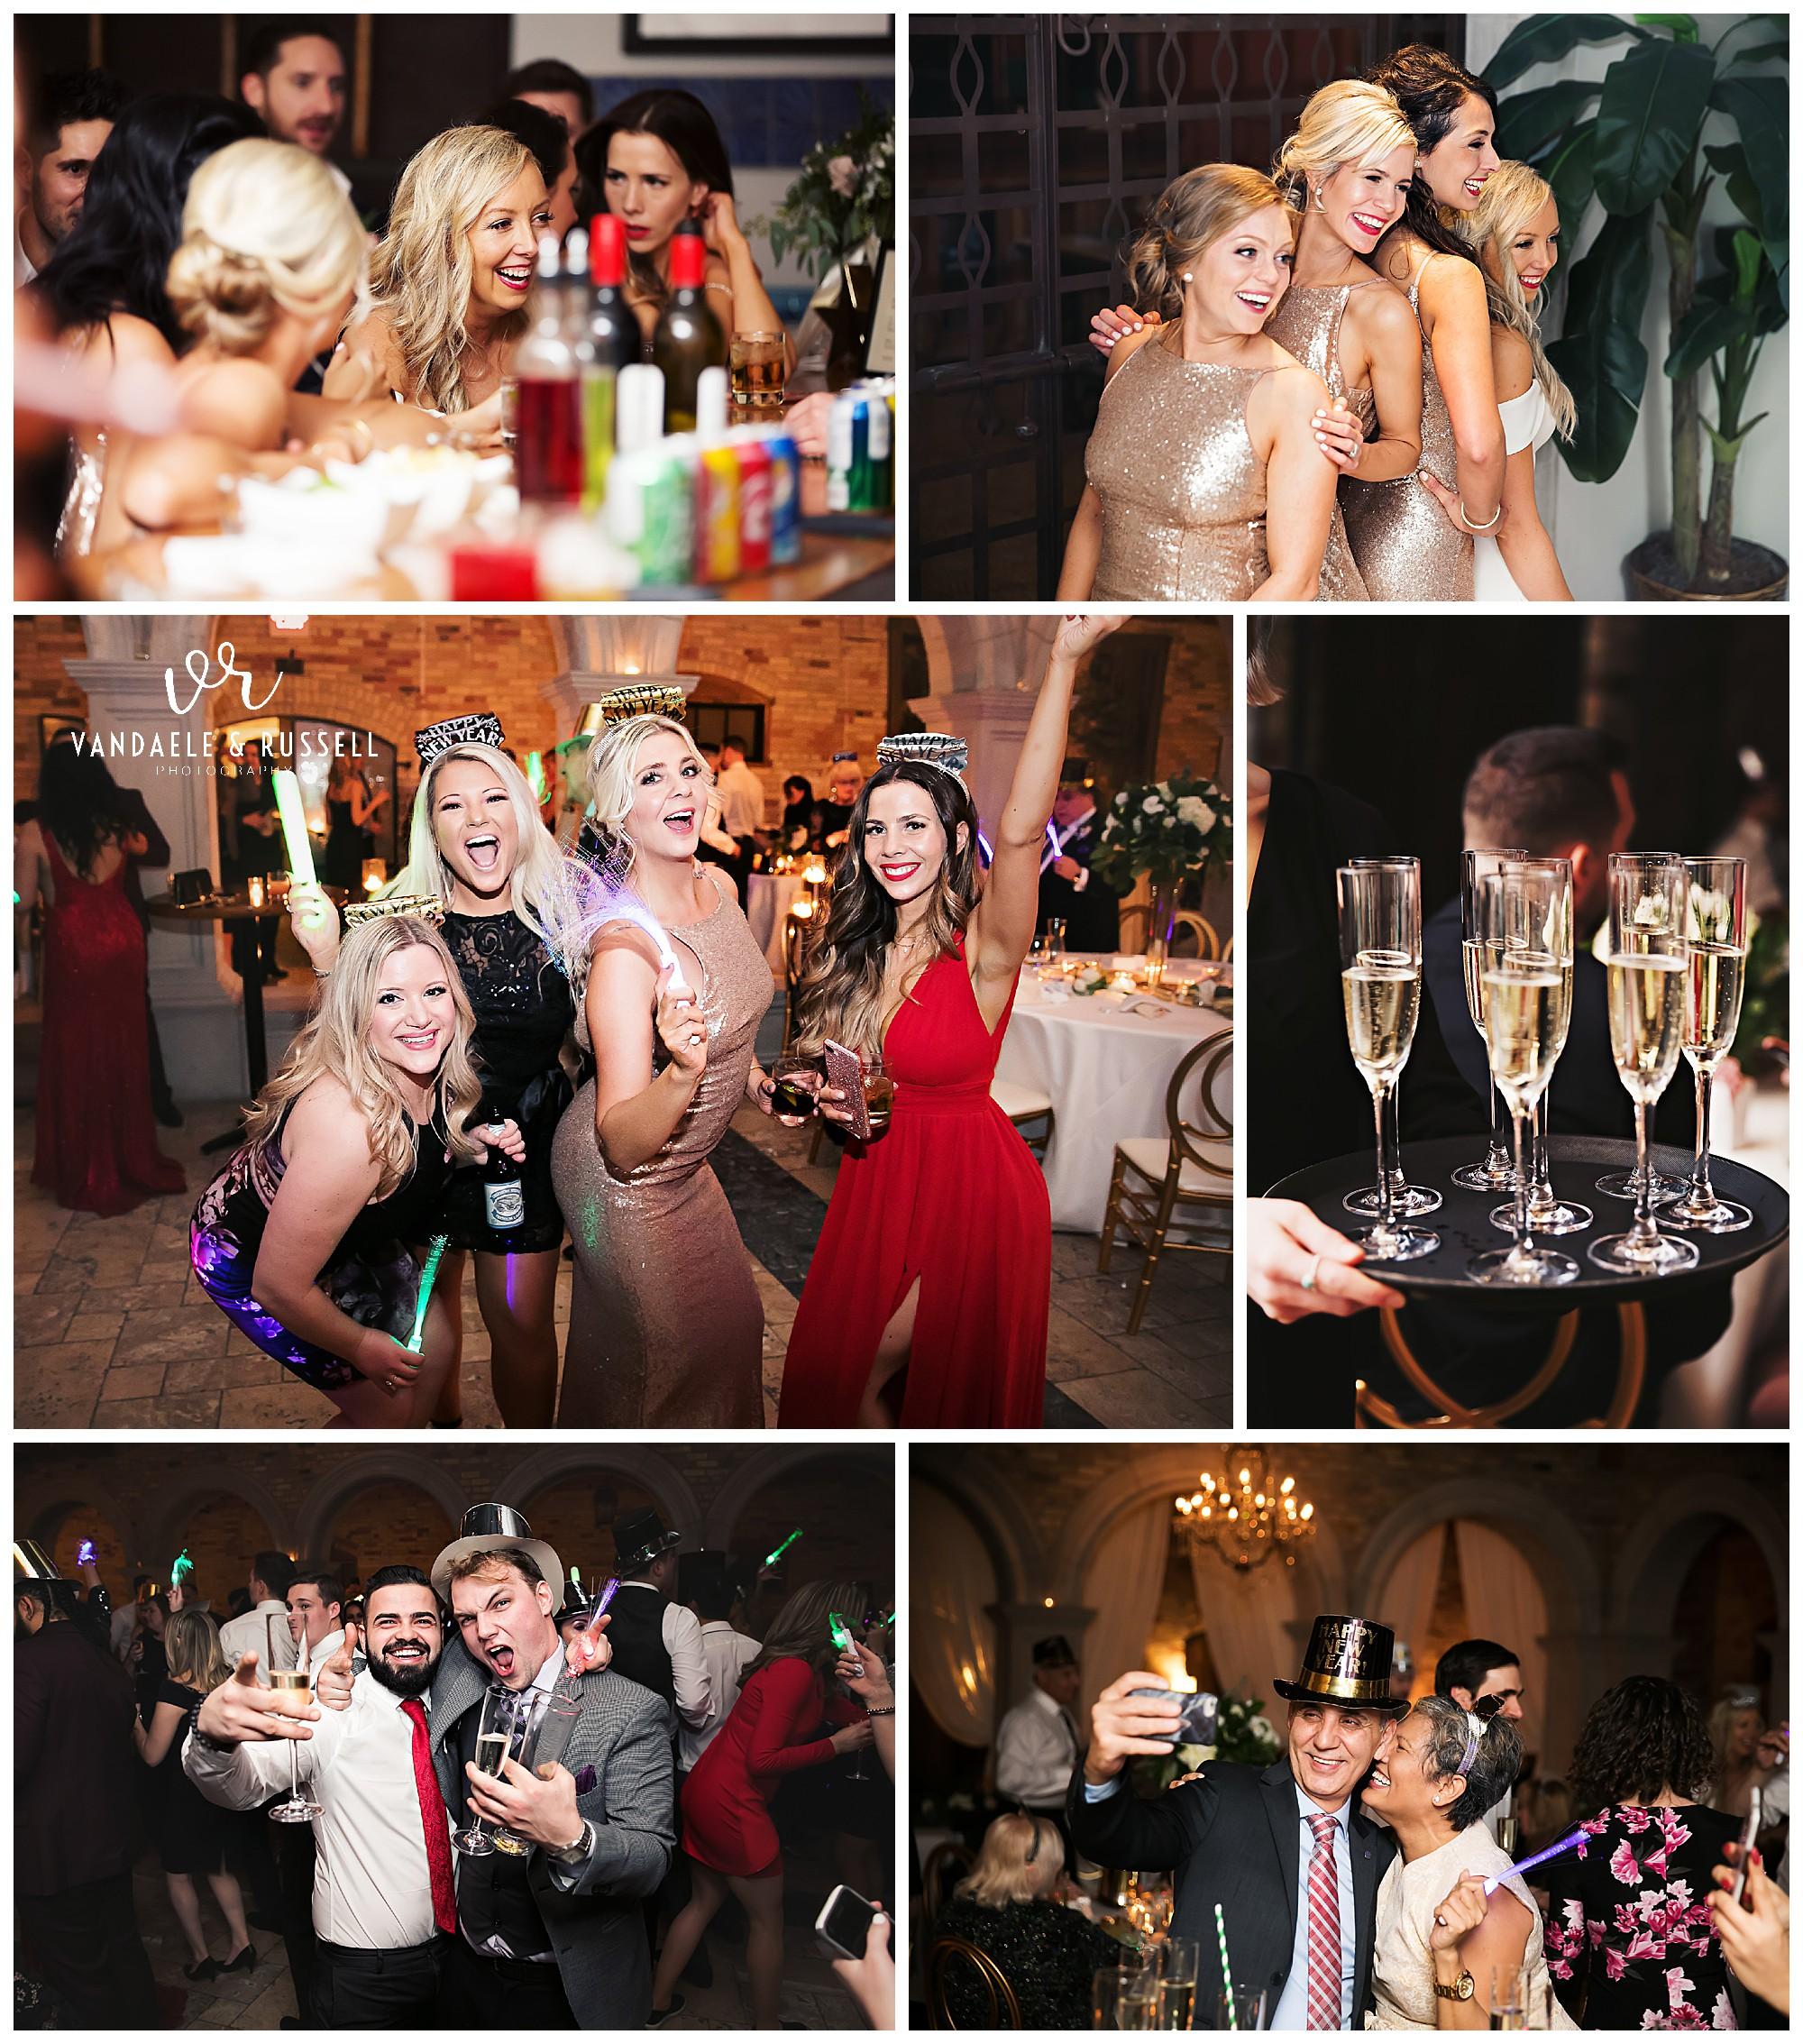 Hacienda-Sarria-Wedding-Photos-NYE-Michelle-Matt-VanDaele-Russell_0049.jpg